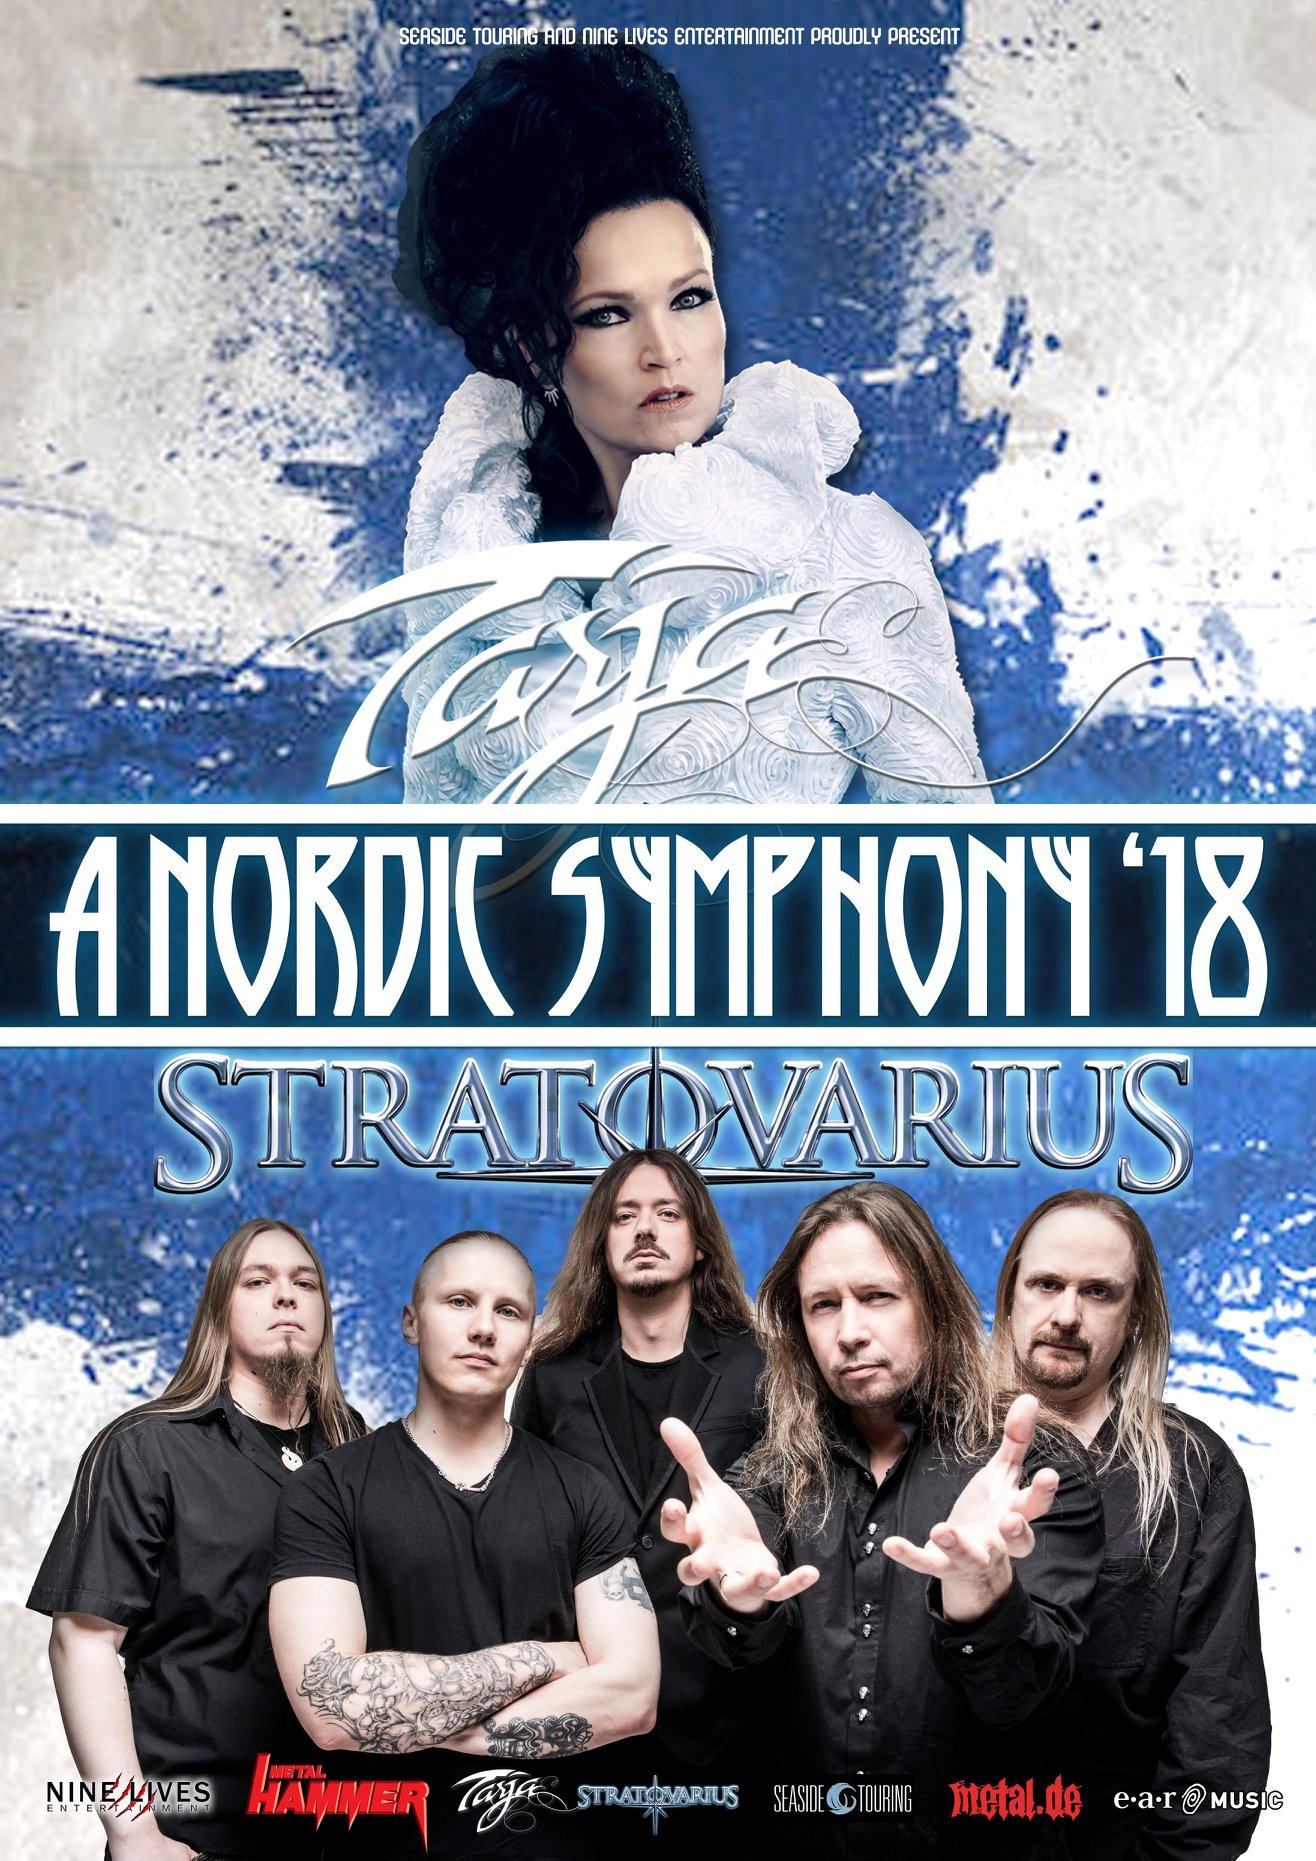 TARJA TURUNEN AND STRATOVARIUS ANNOUNCE A NORDIC SYMPHONY '18 CO-HEADLINE TOUR